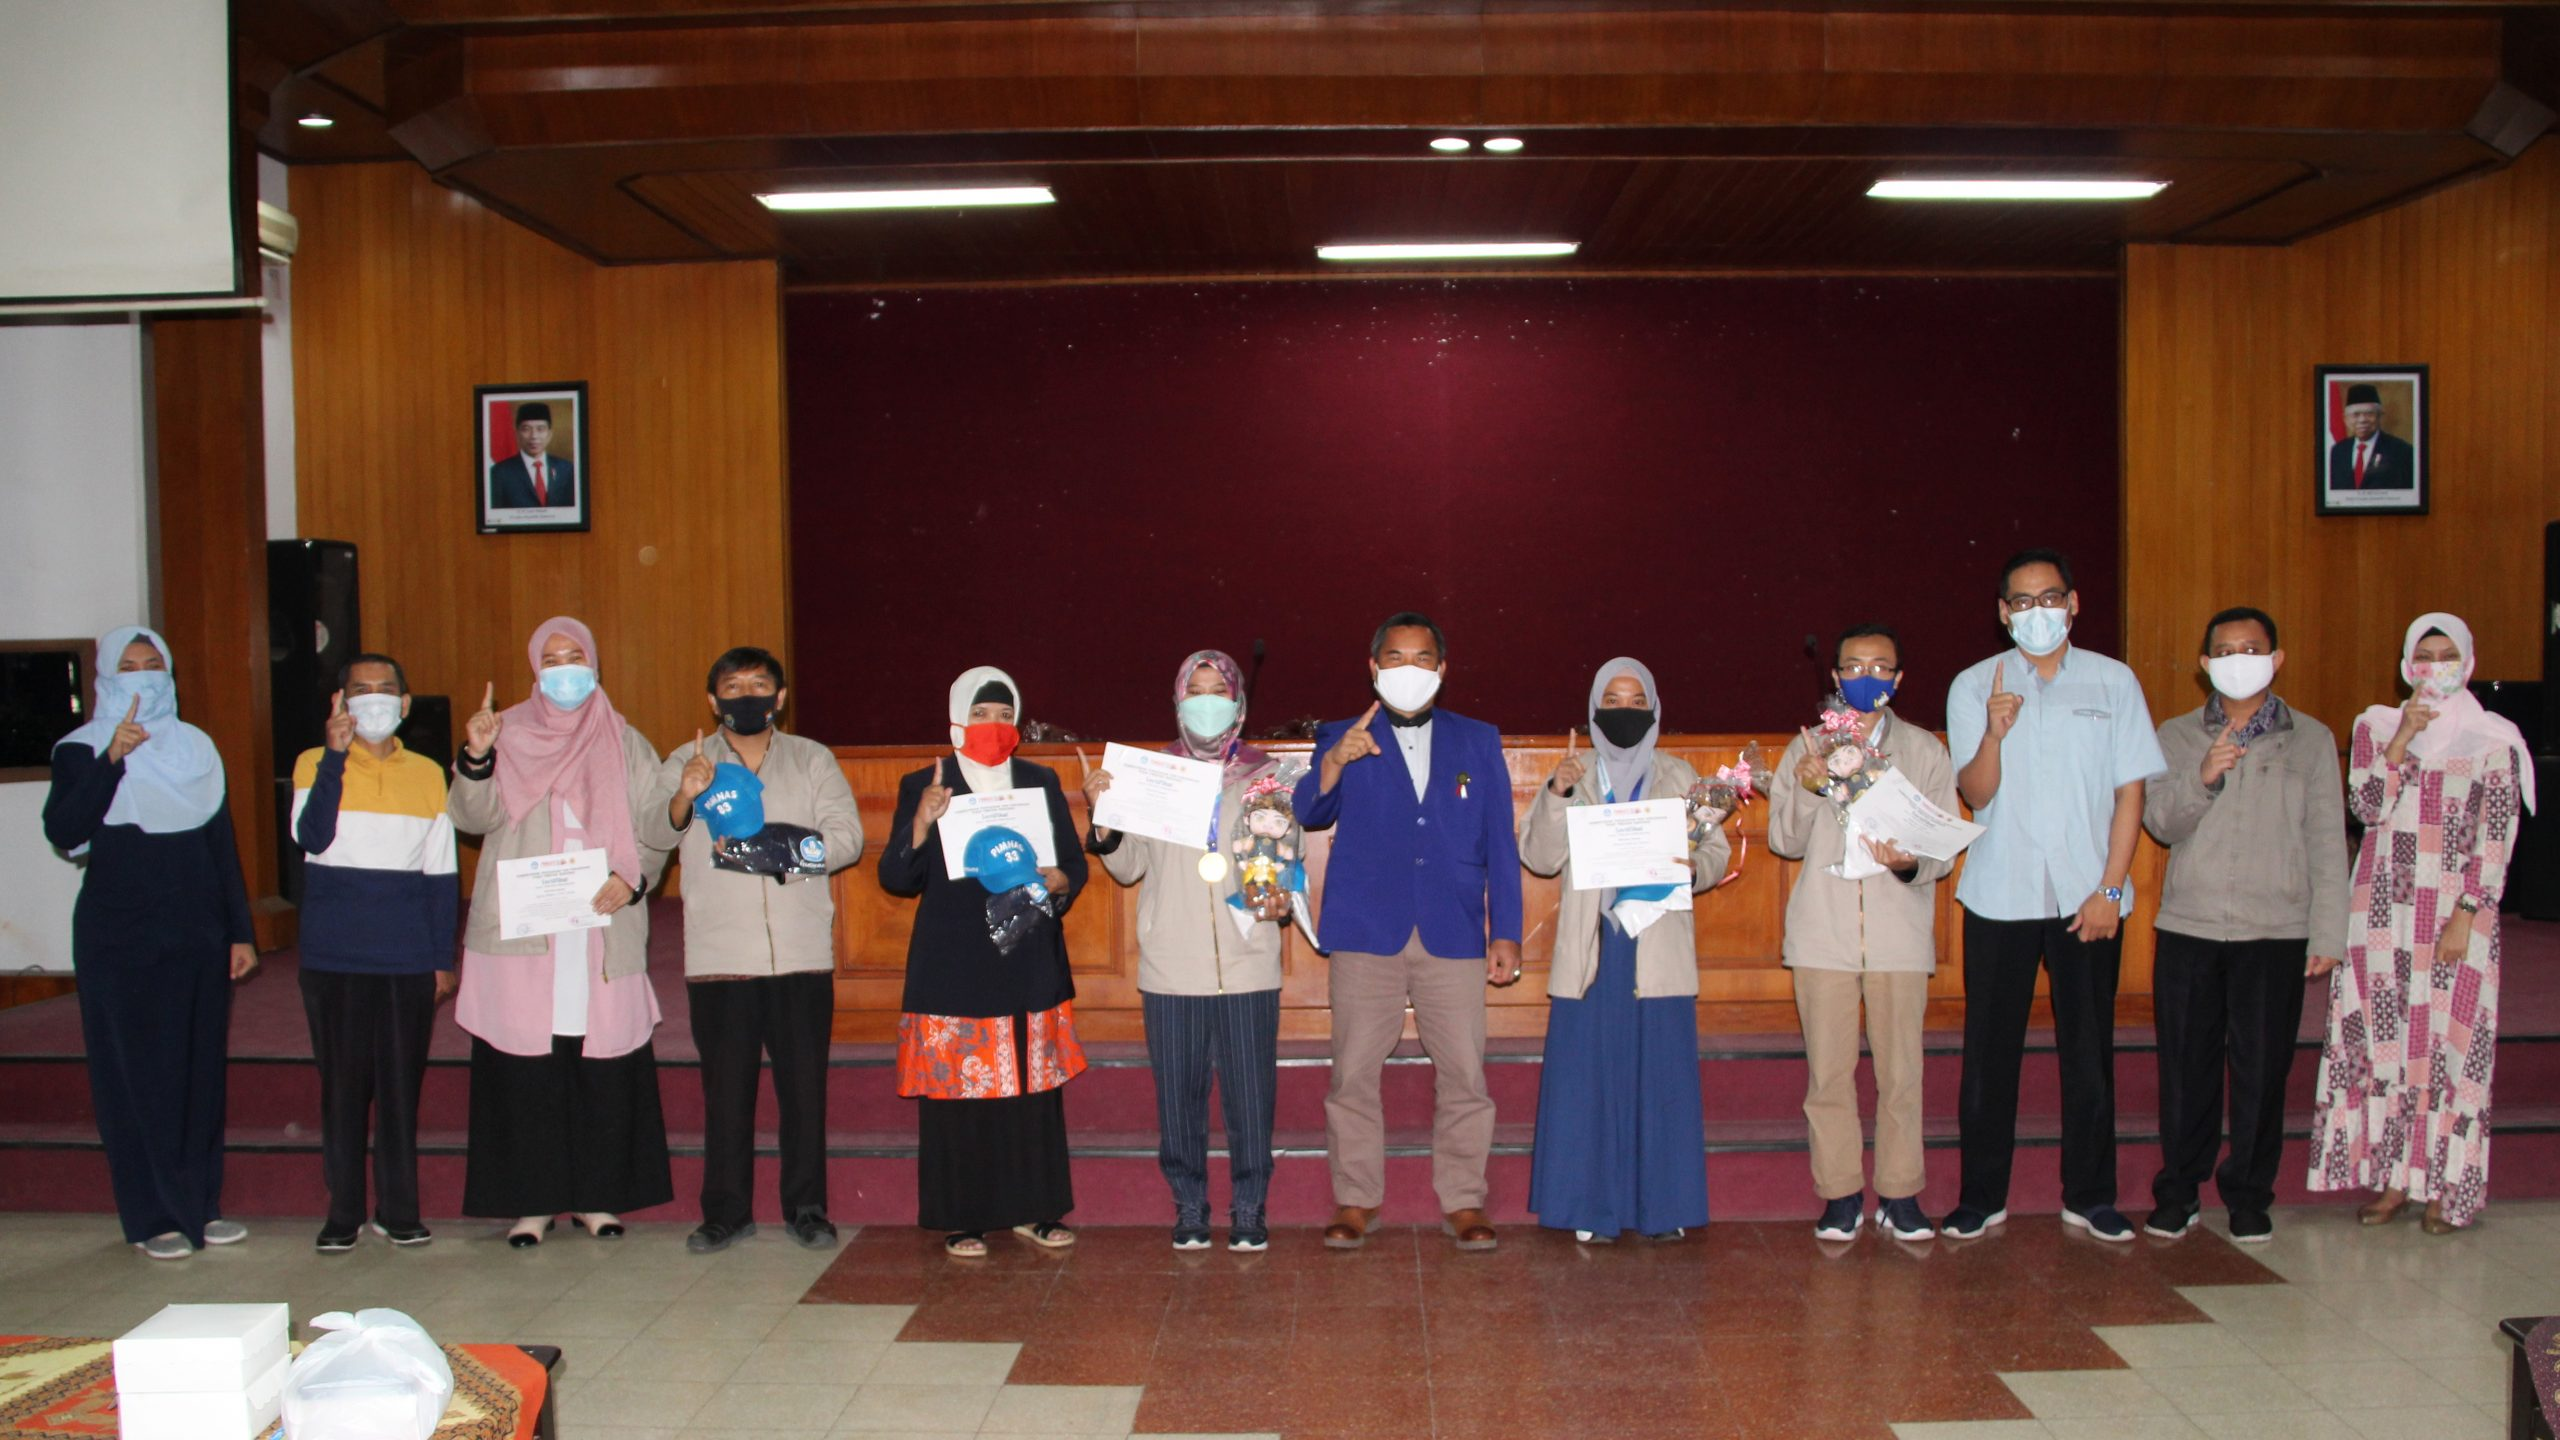 Photo of Dokumentasi Penyerahan Cinderamata Kontingen Universitas Negeri Malang pada Ajang Pimnas ke-33